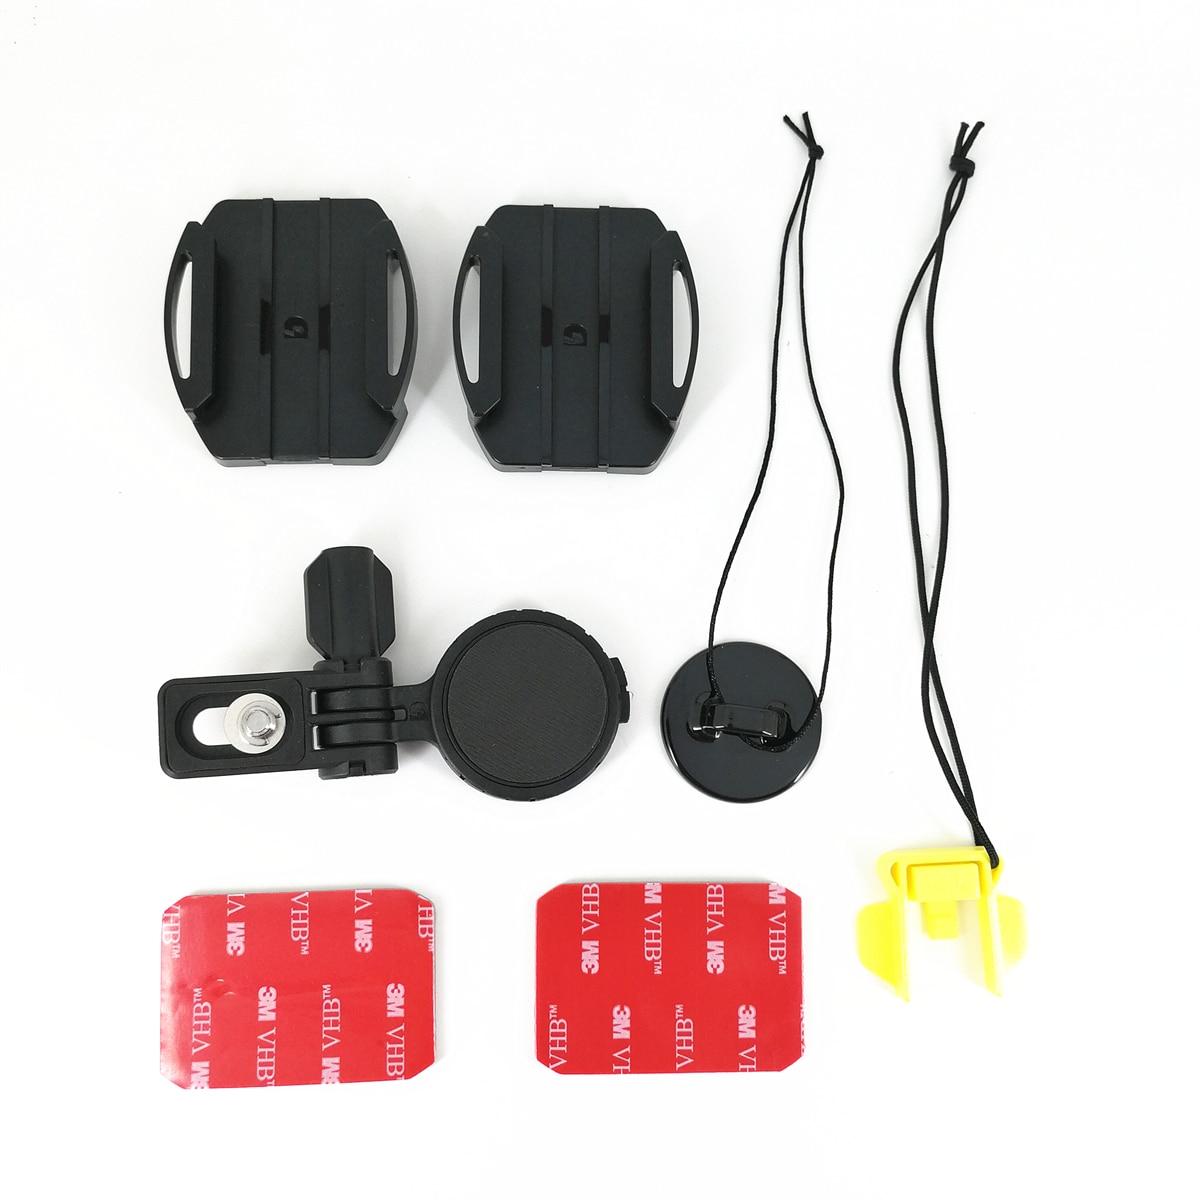 Adhesivo curvo casco ajustable montaje lateral para Sony HDR AS50 AS30 AS20 AS15 AS10 AS300 AS200 AS100 AZ1 X3000 X1000 como VCT-HSM1